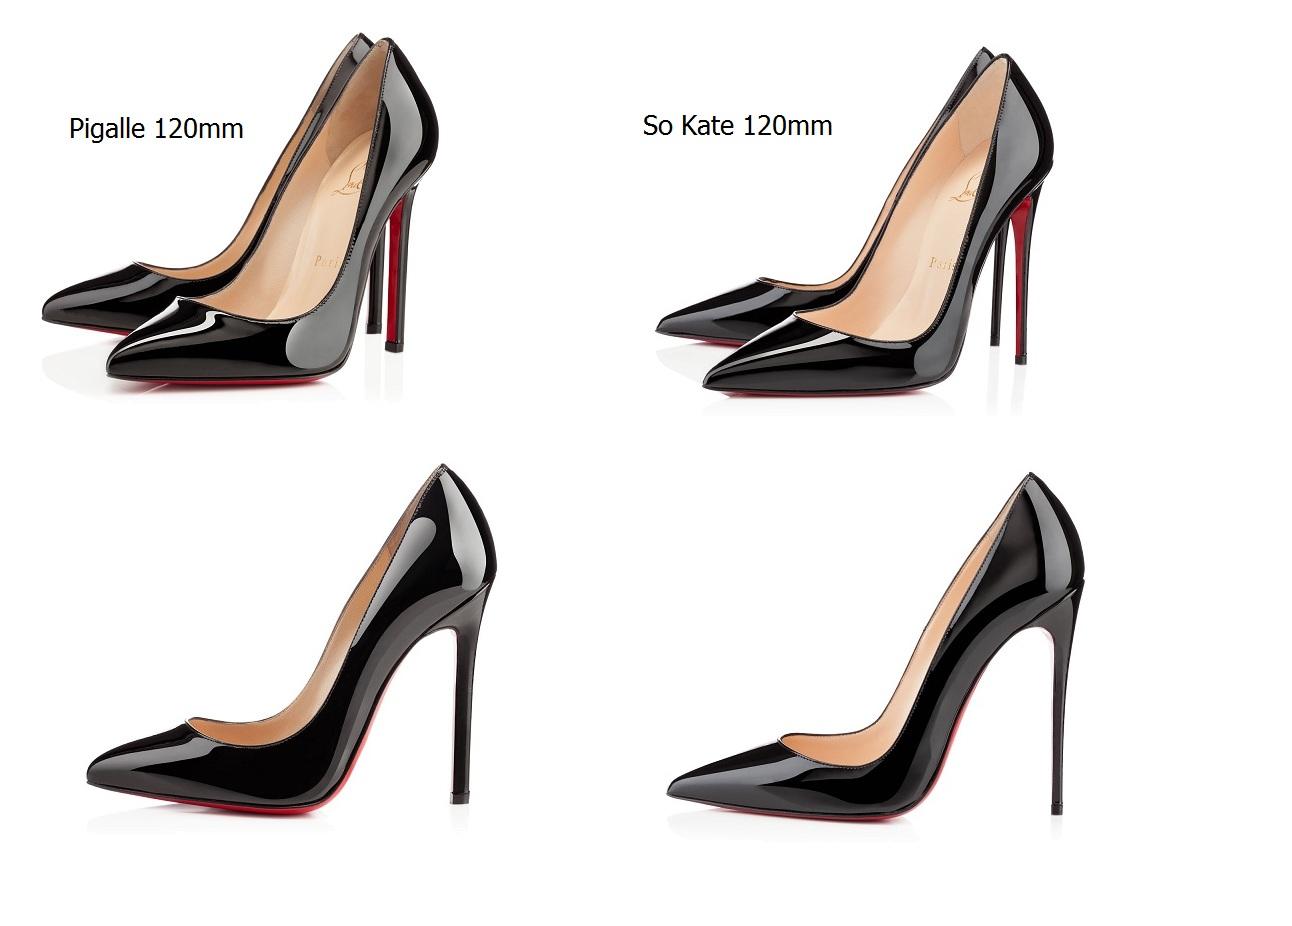 171c5db47ca9 Bimbo Uniforms – Shoes  Christian Louboutin So Kate - Pink Bimbo Academy